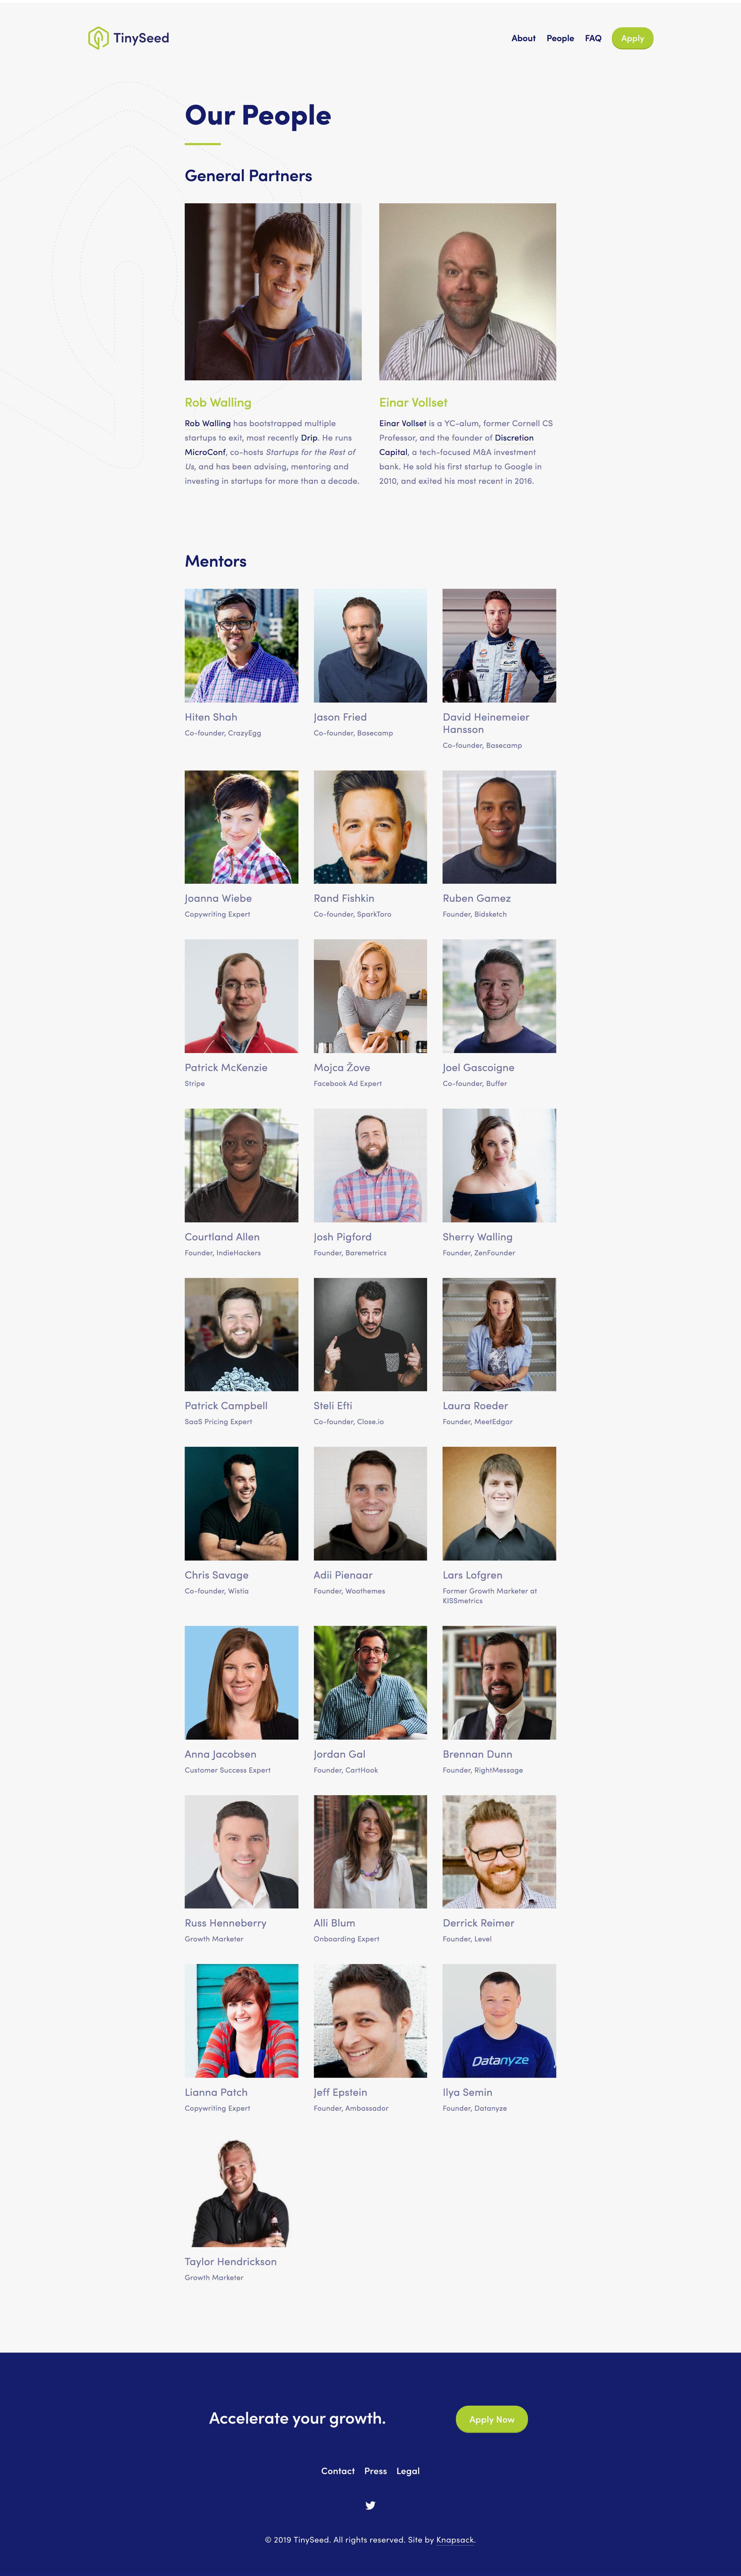 TinySeed-People-Macbook-Overlay.jpg